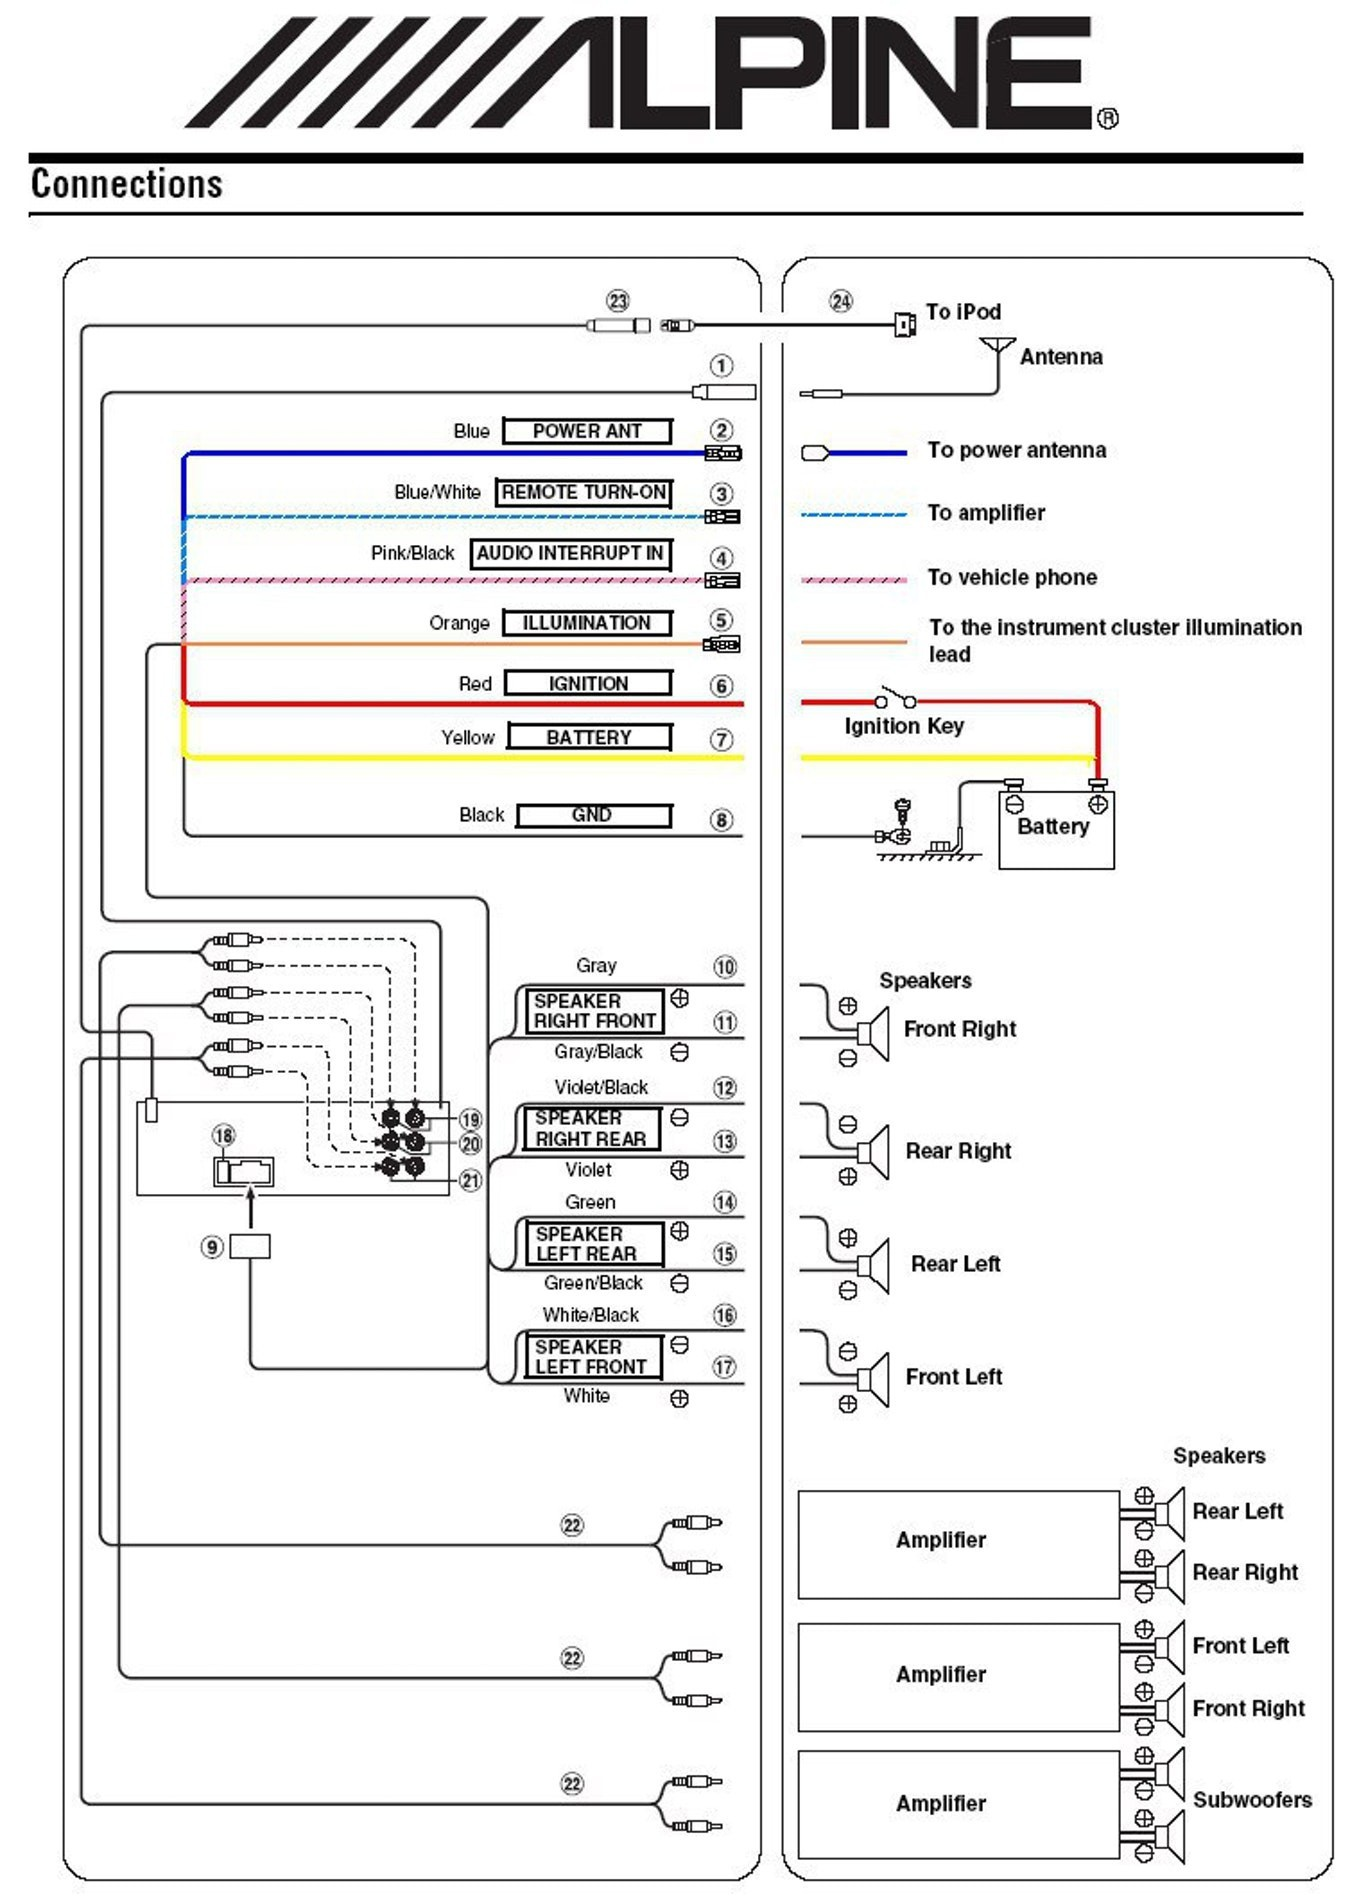 pioneer avic n1 wiring diagram bm 5555  dvd diagram  bm 5555  dvd diagram